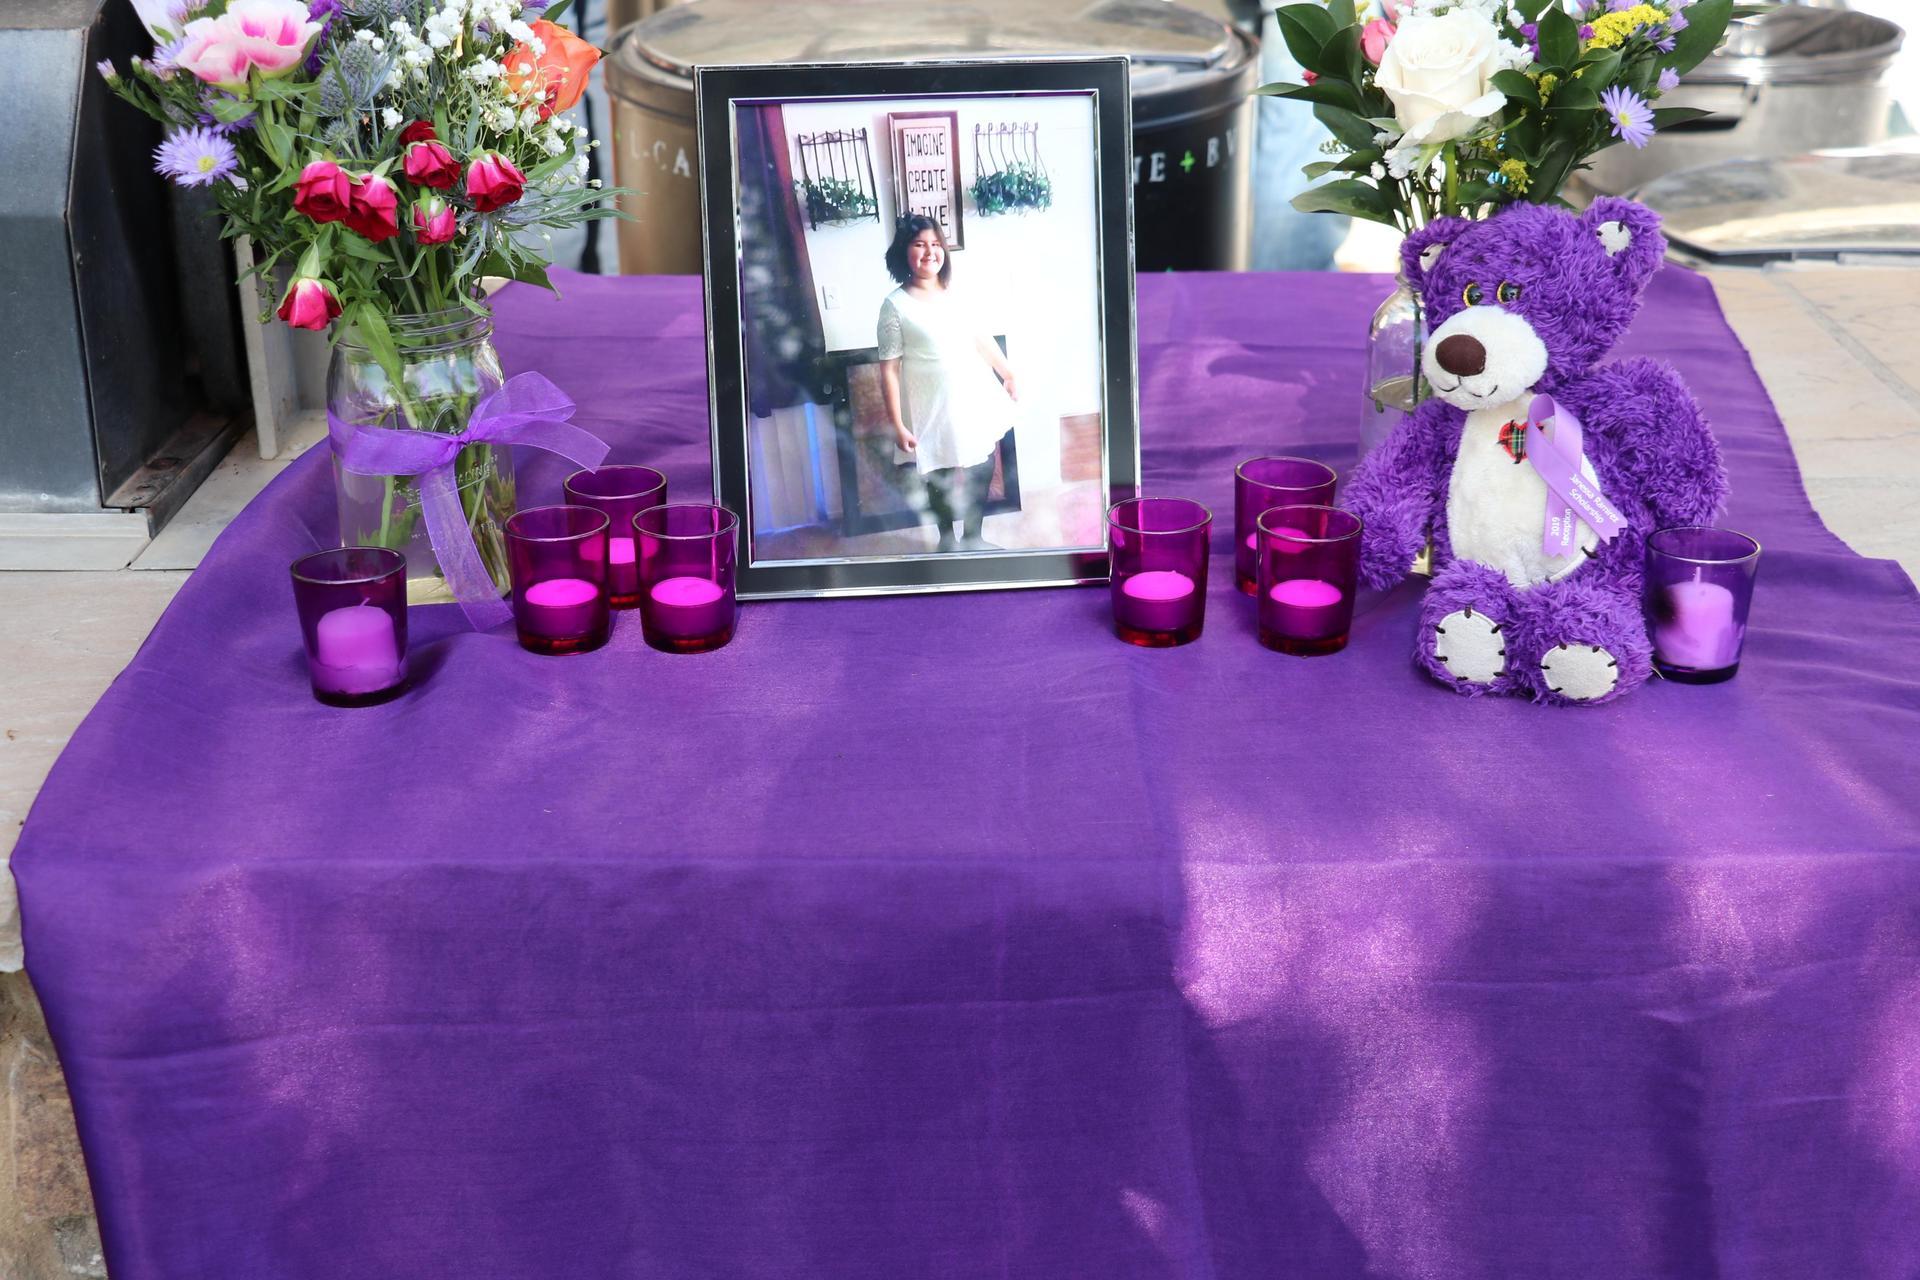 Memorial Table for Janessa Ramirez